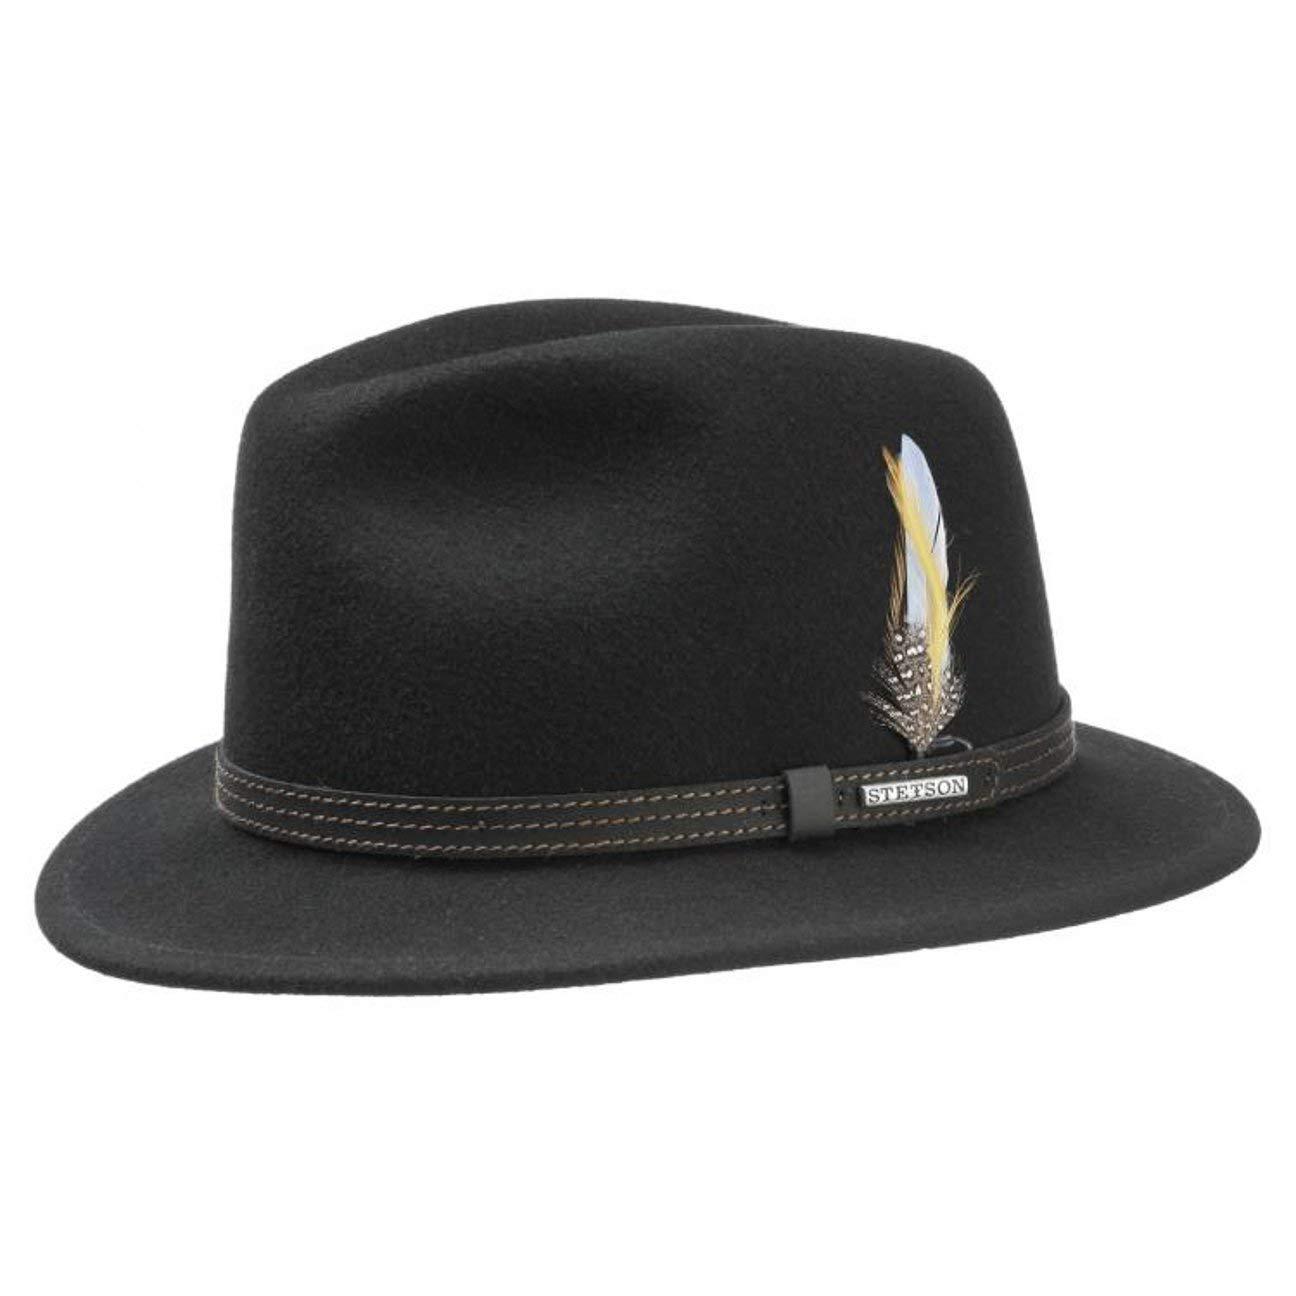 0c8b2df20be2bb Stetson Vidor VitaFelt Wool Felt Hat weatherproof traveller: Amazon.co.uk:  Clothing